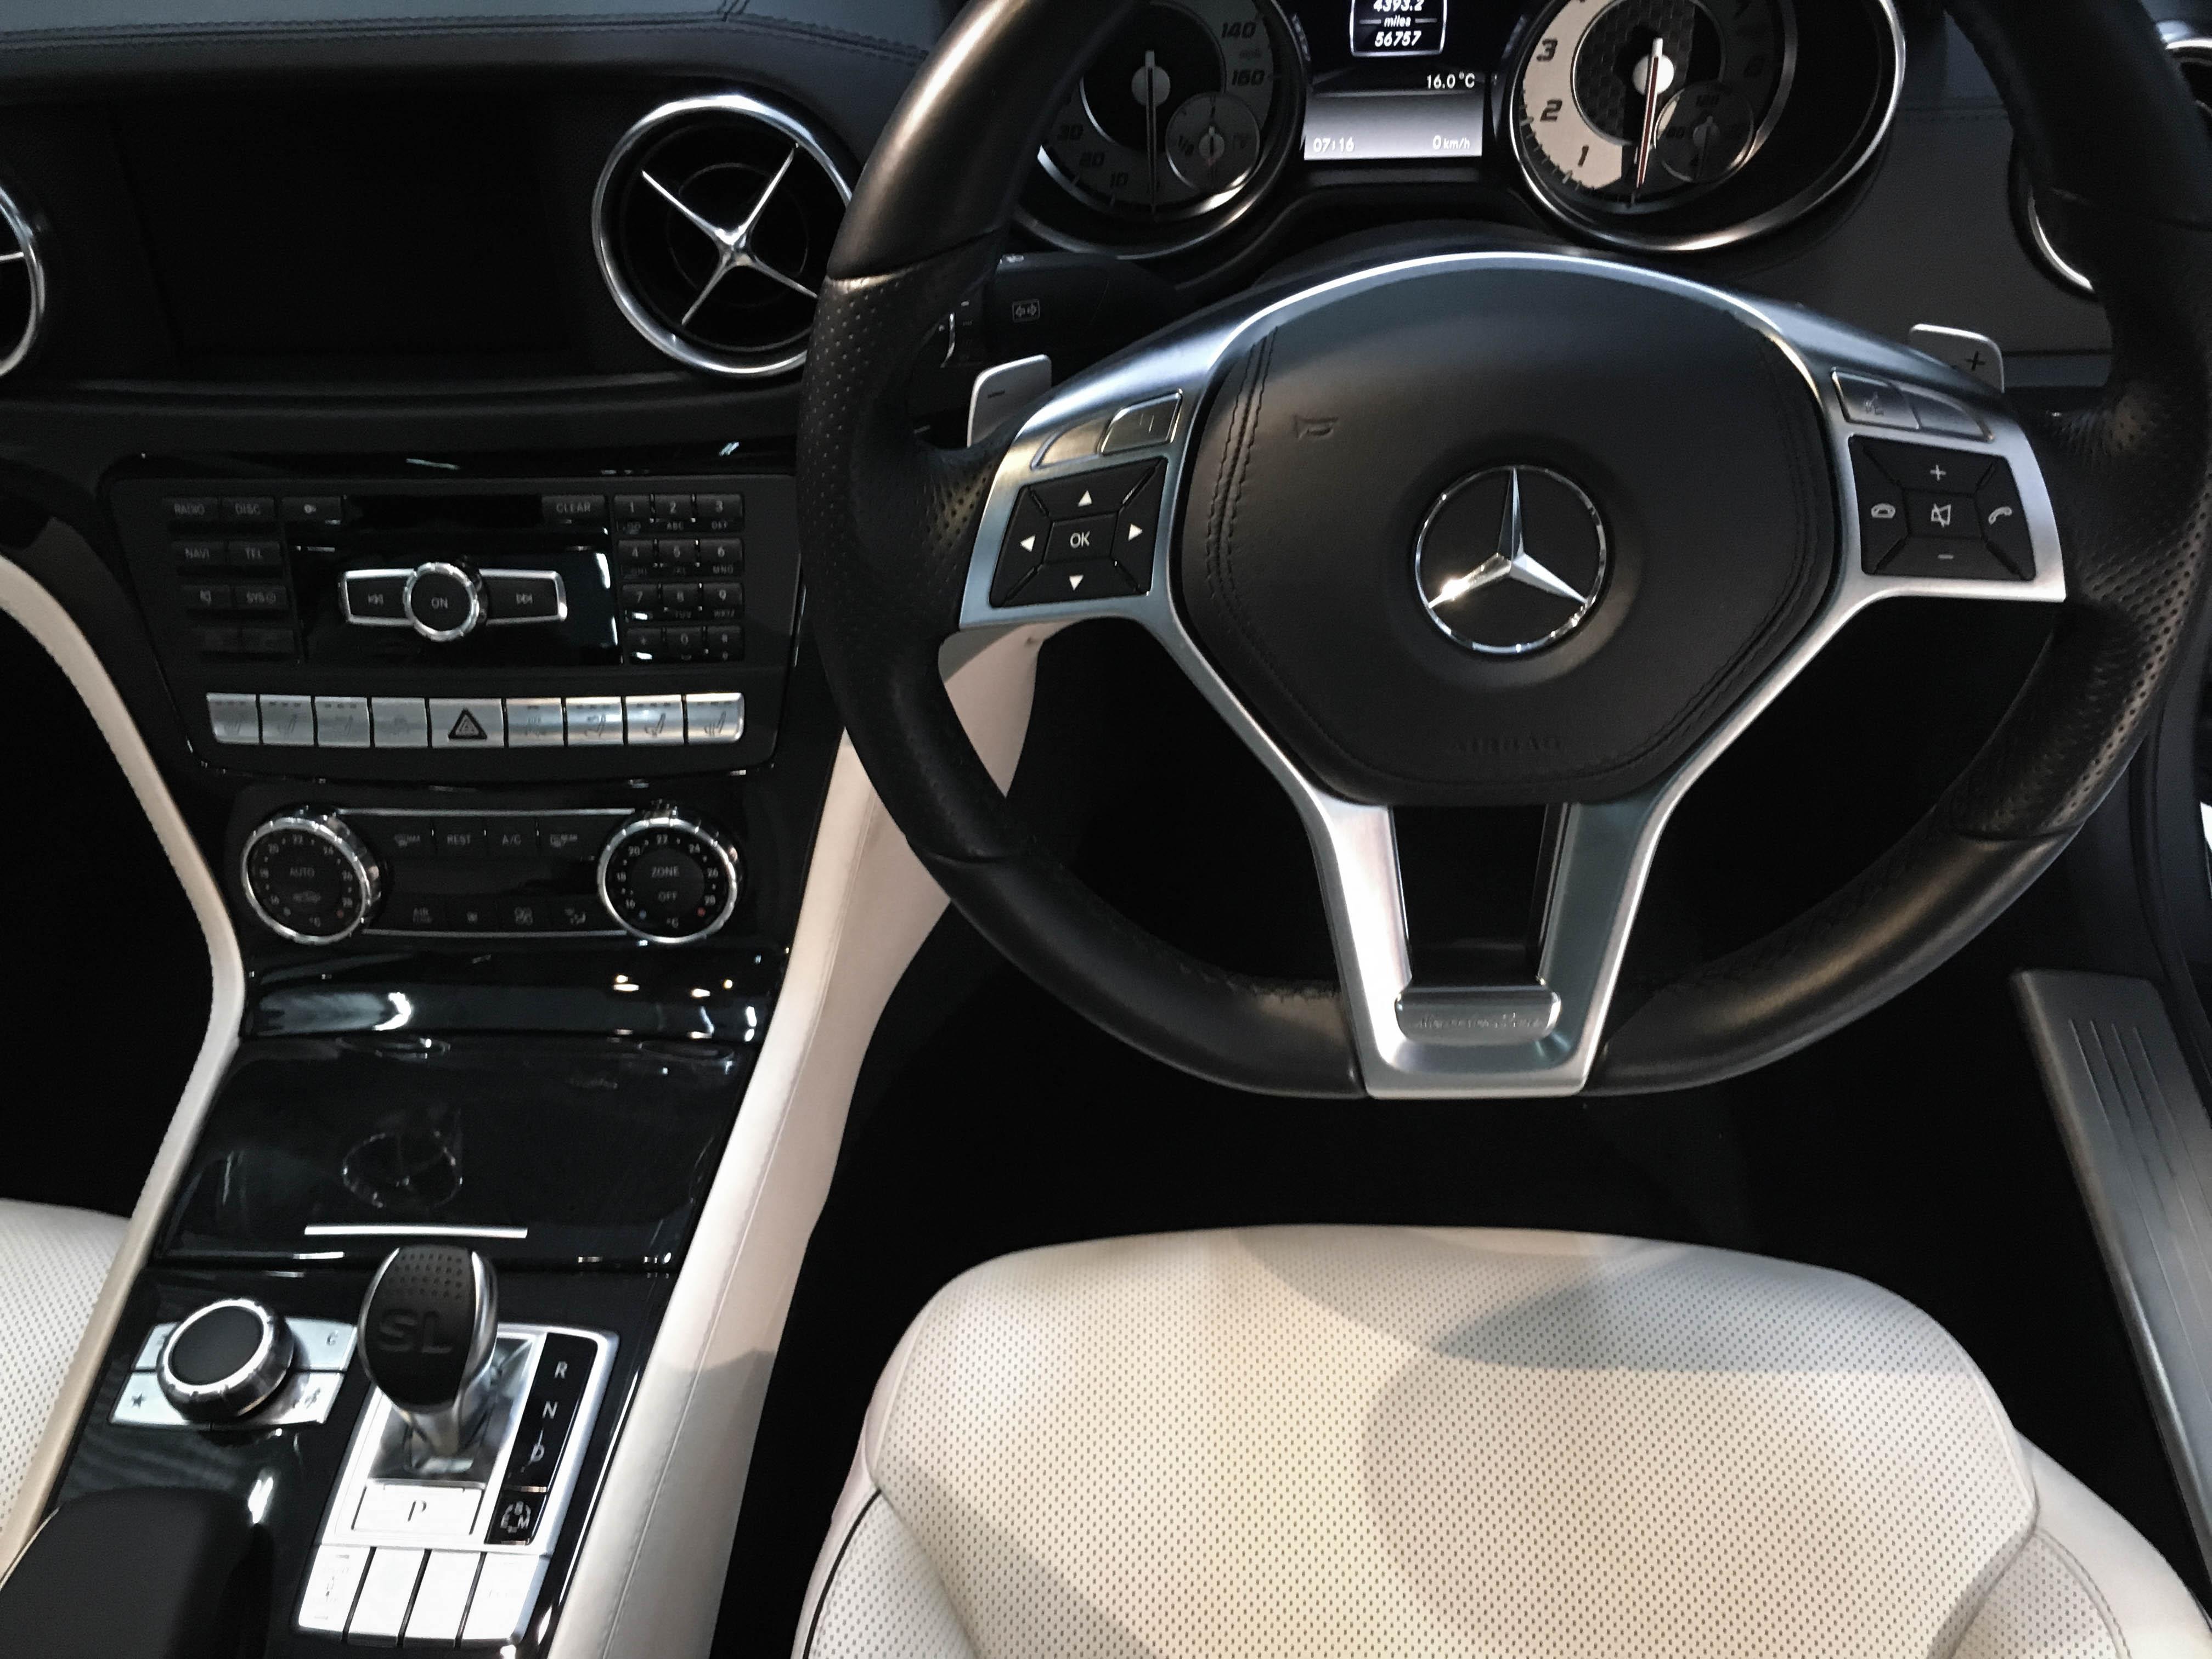 Mercedes SL350 – Interior